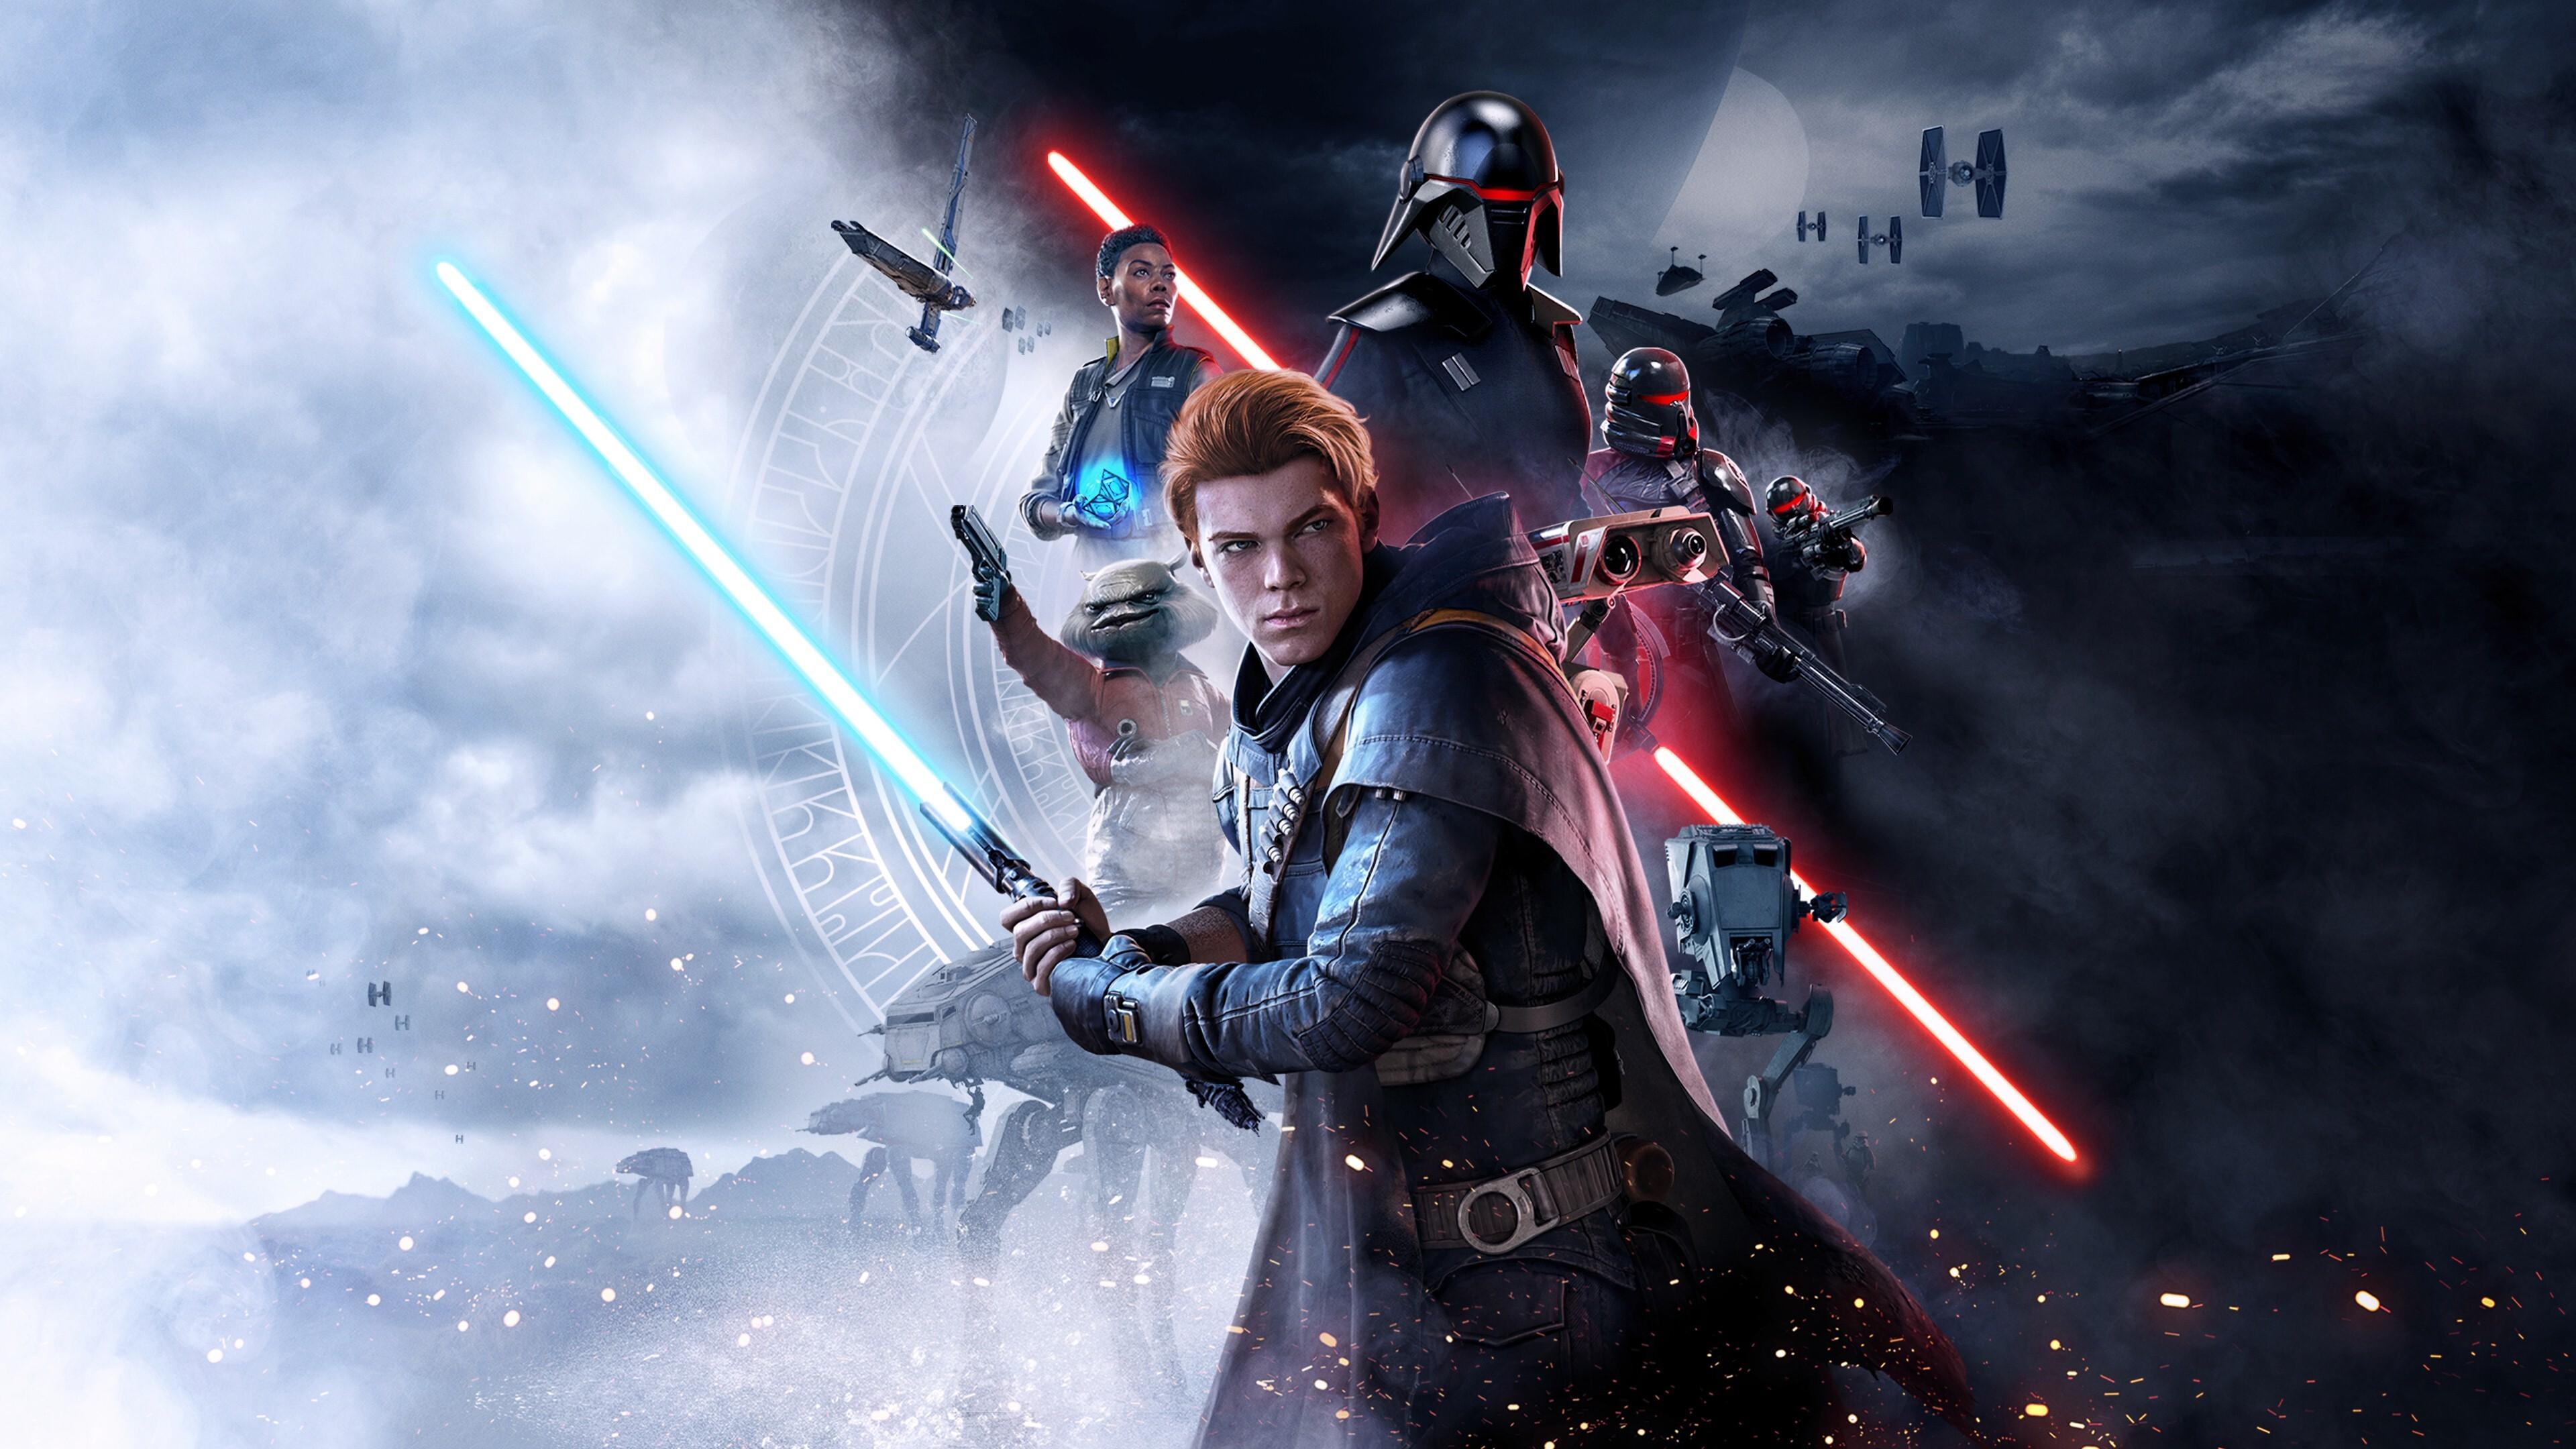 Star Wars Jedi Fallen Order 2 Game Wallpaper | HD Wallpapers